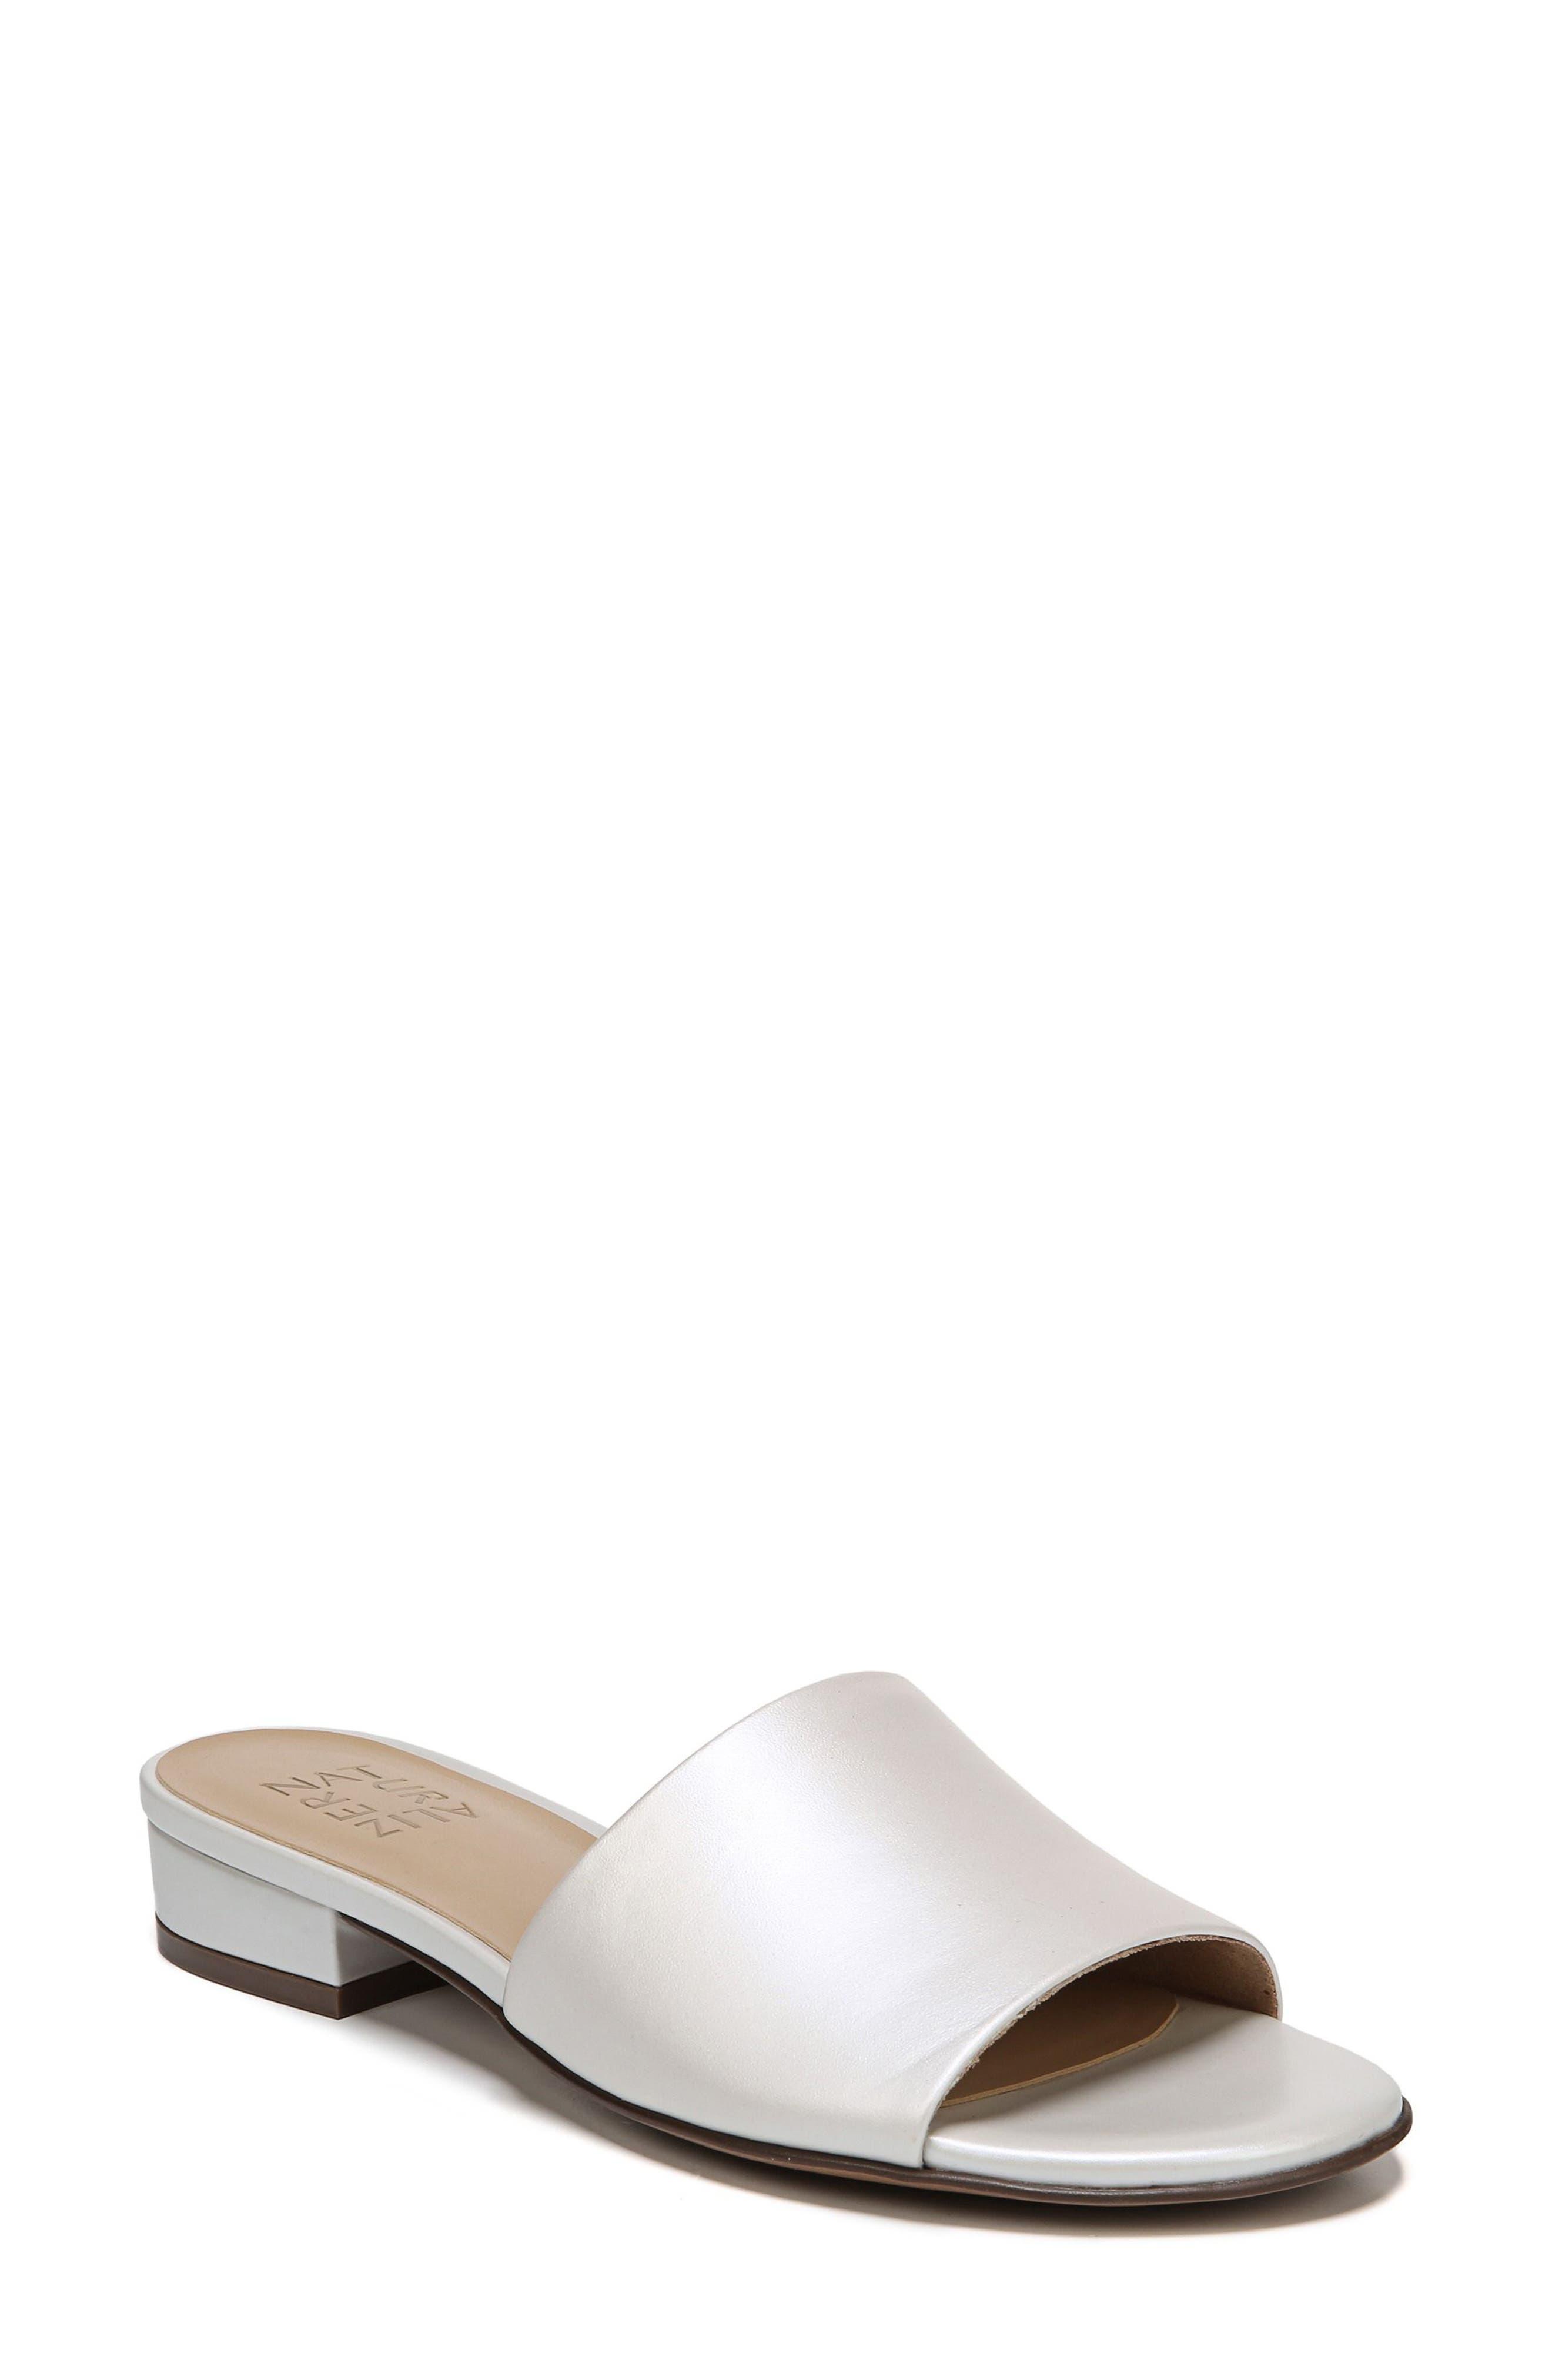 Alternate Image 1 Selected - Naturalizer Mason Slide Sandal